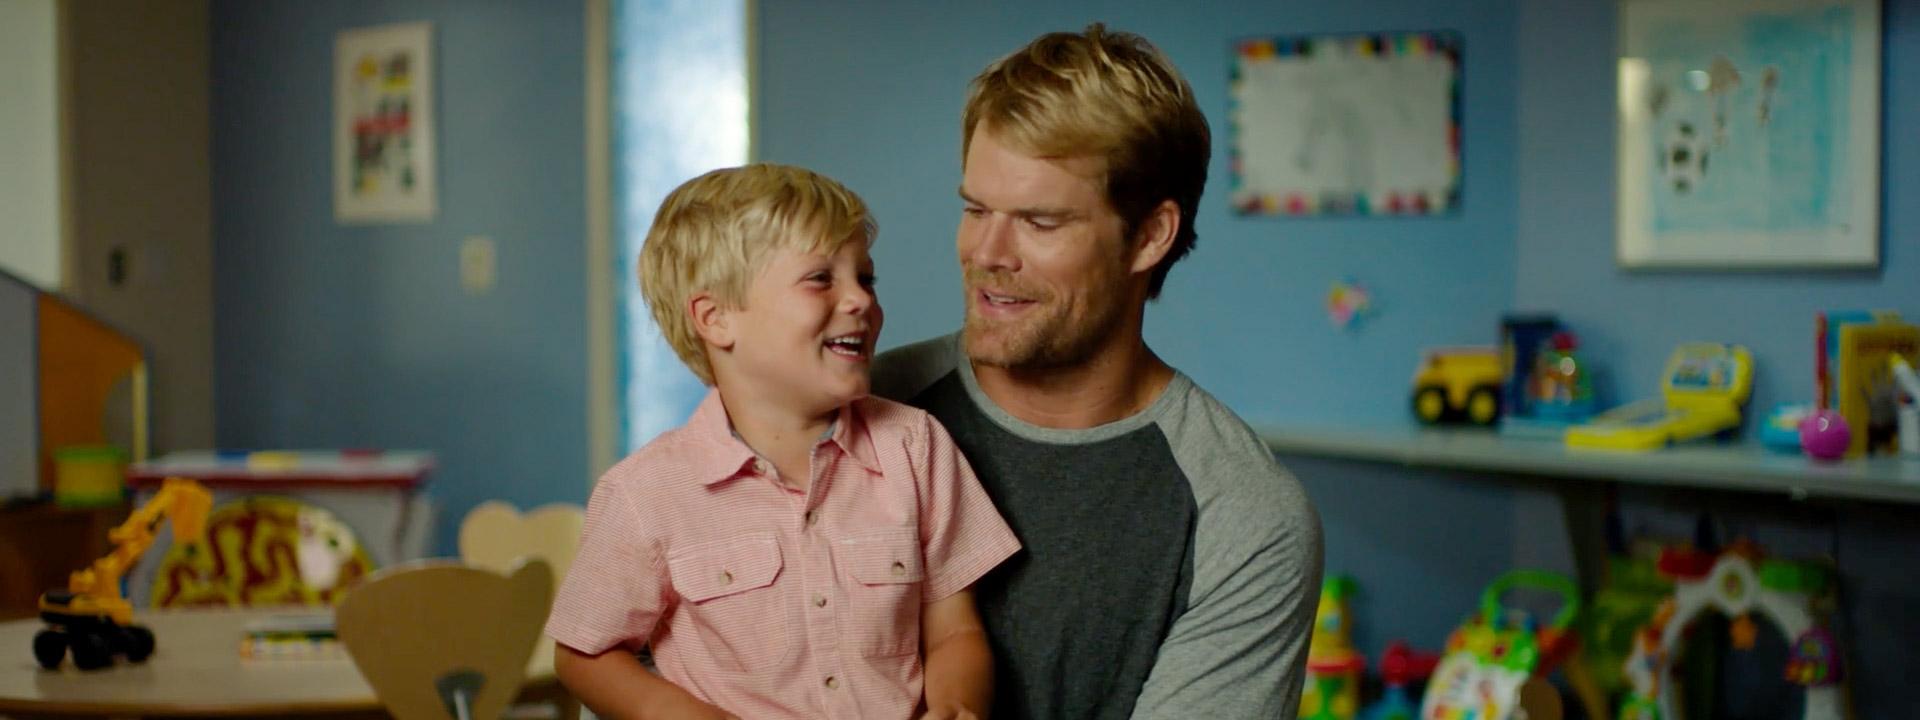 Greg Olsen helps families of children with congenital heart disease through The HEARTest Yard.